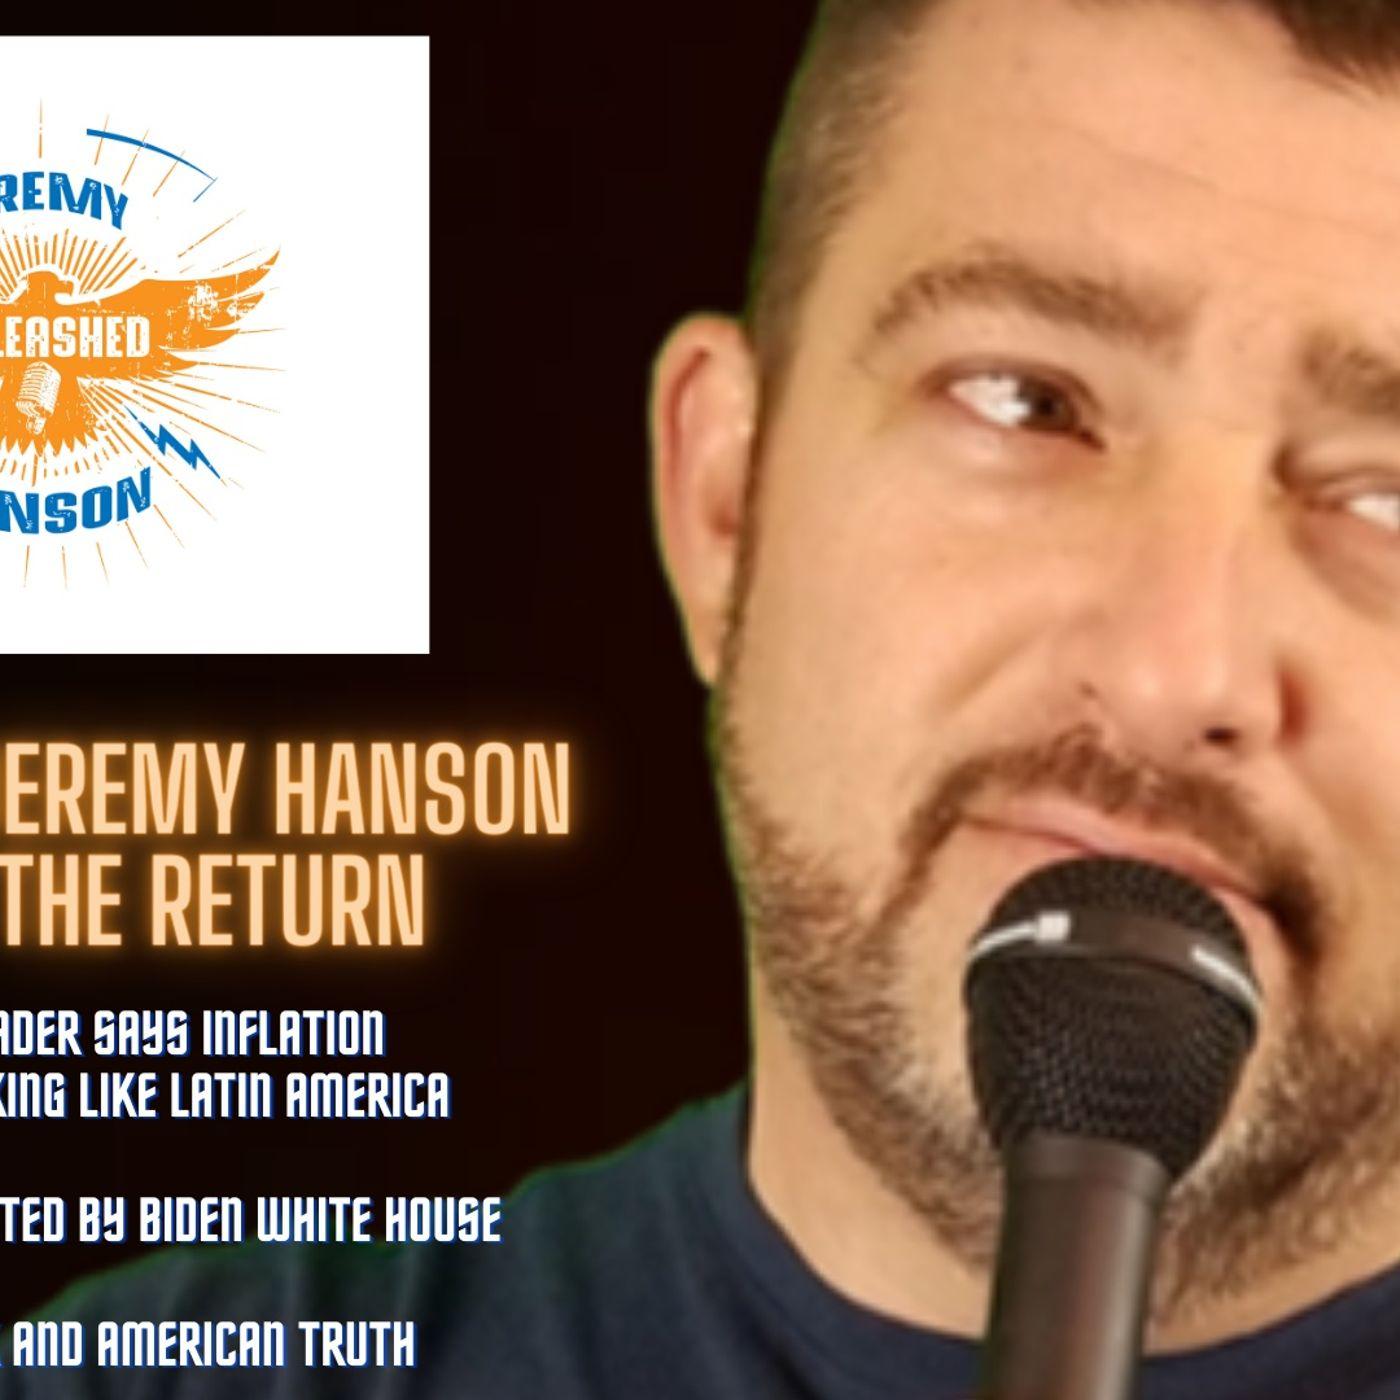 Unleashed Jeremy Hanson 7 12 21 the return!!